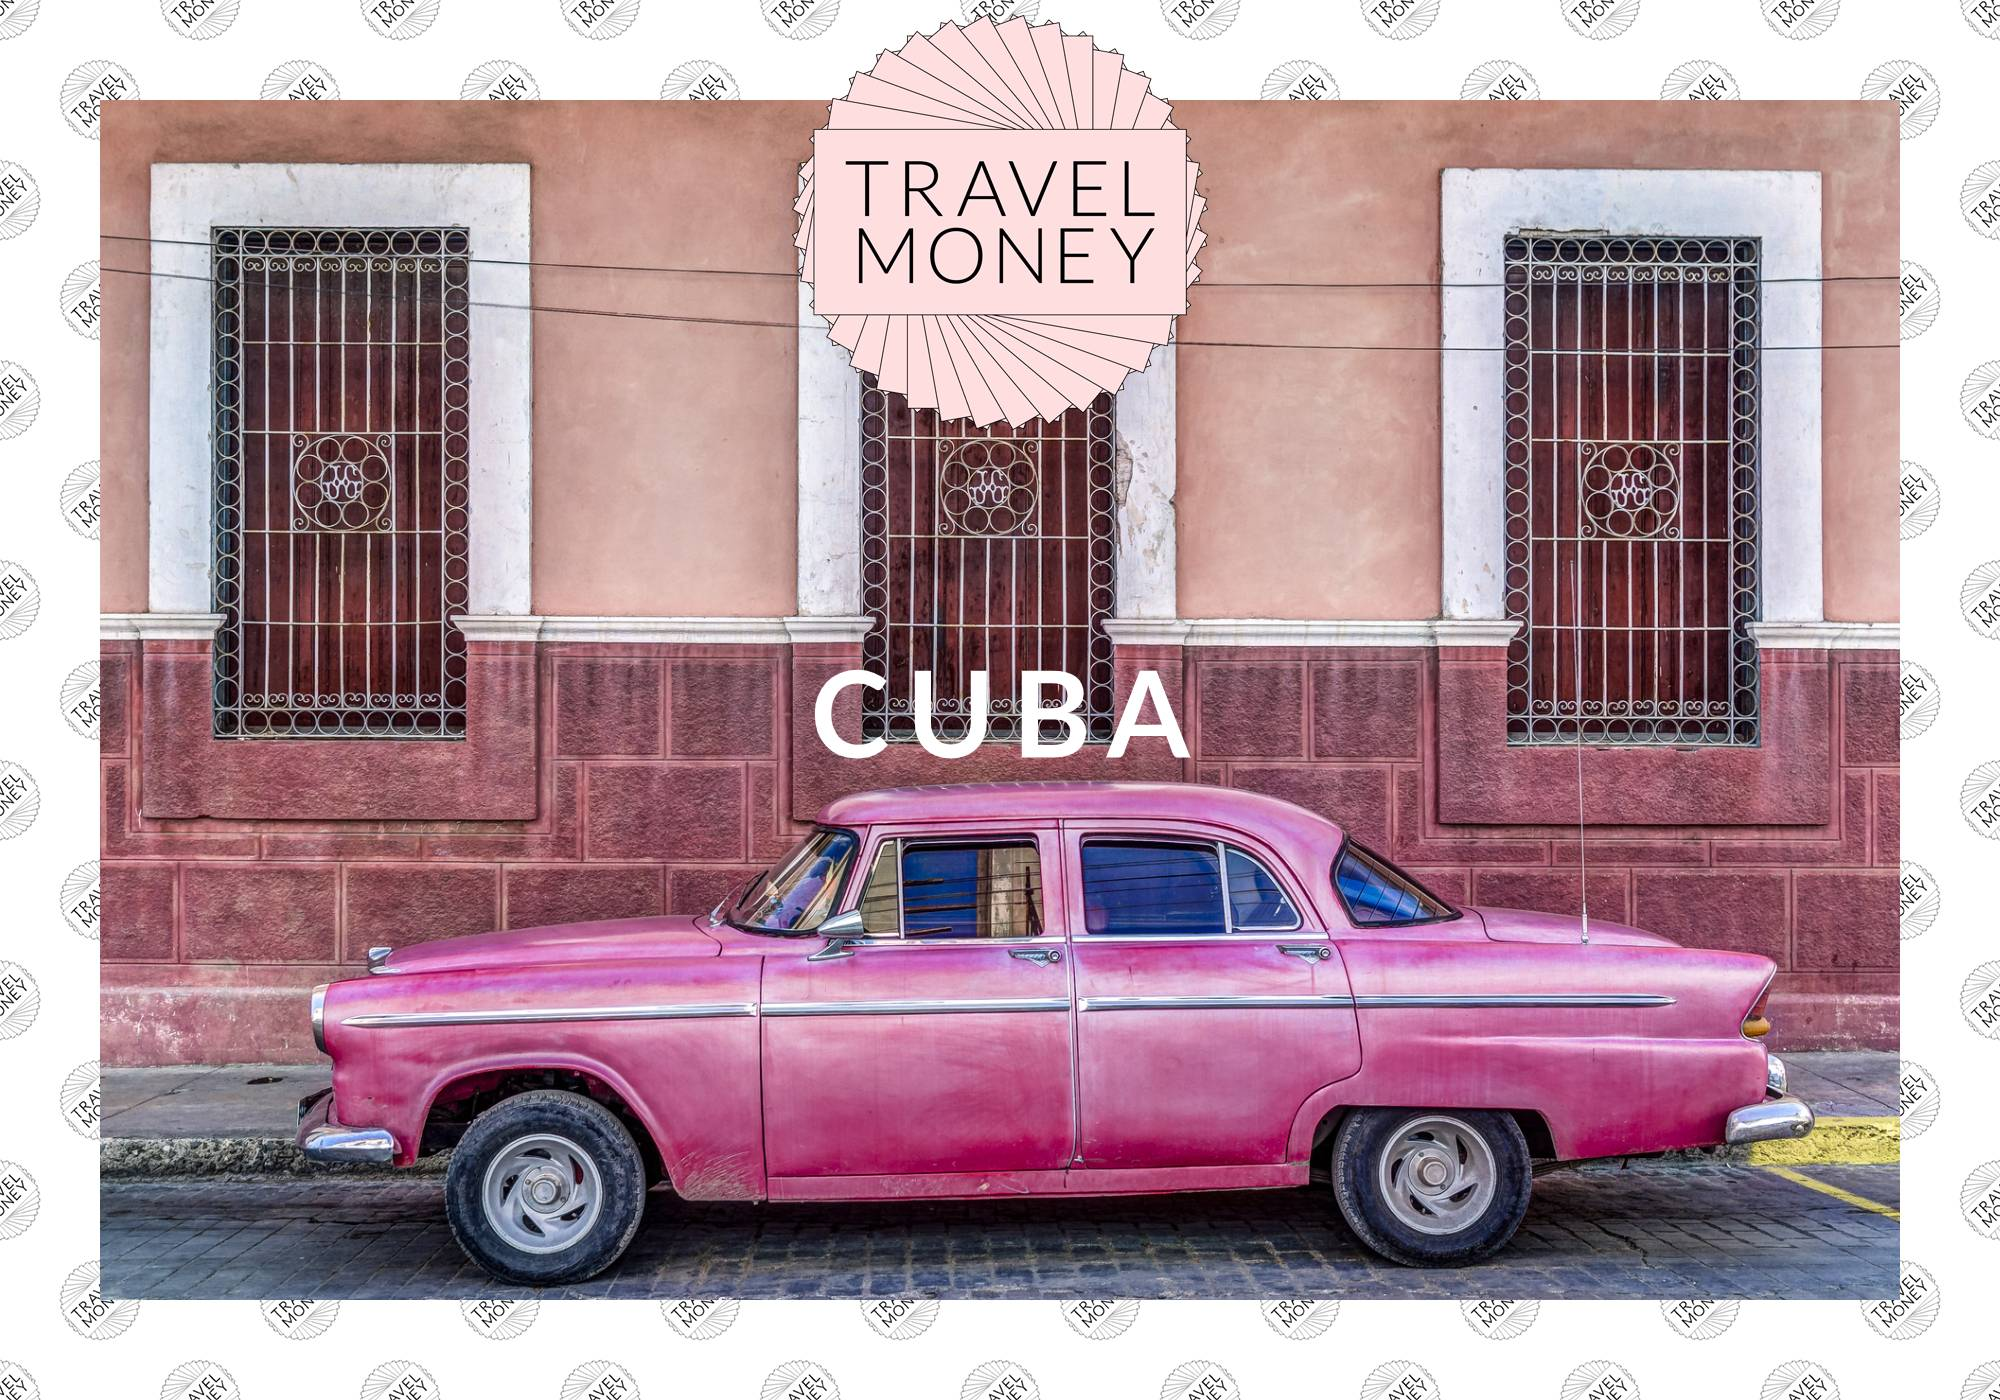 TRAVEL MONEY - CUBA